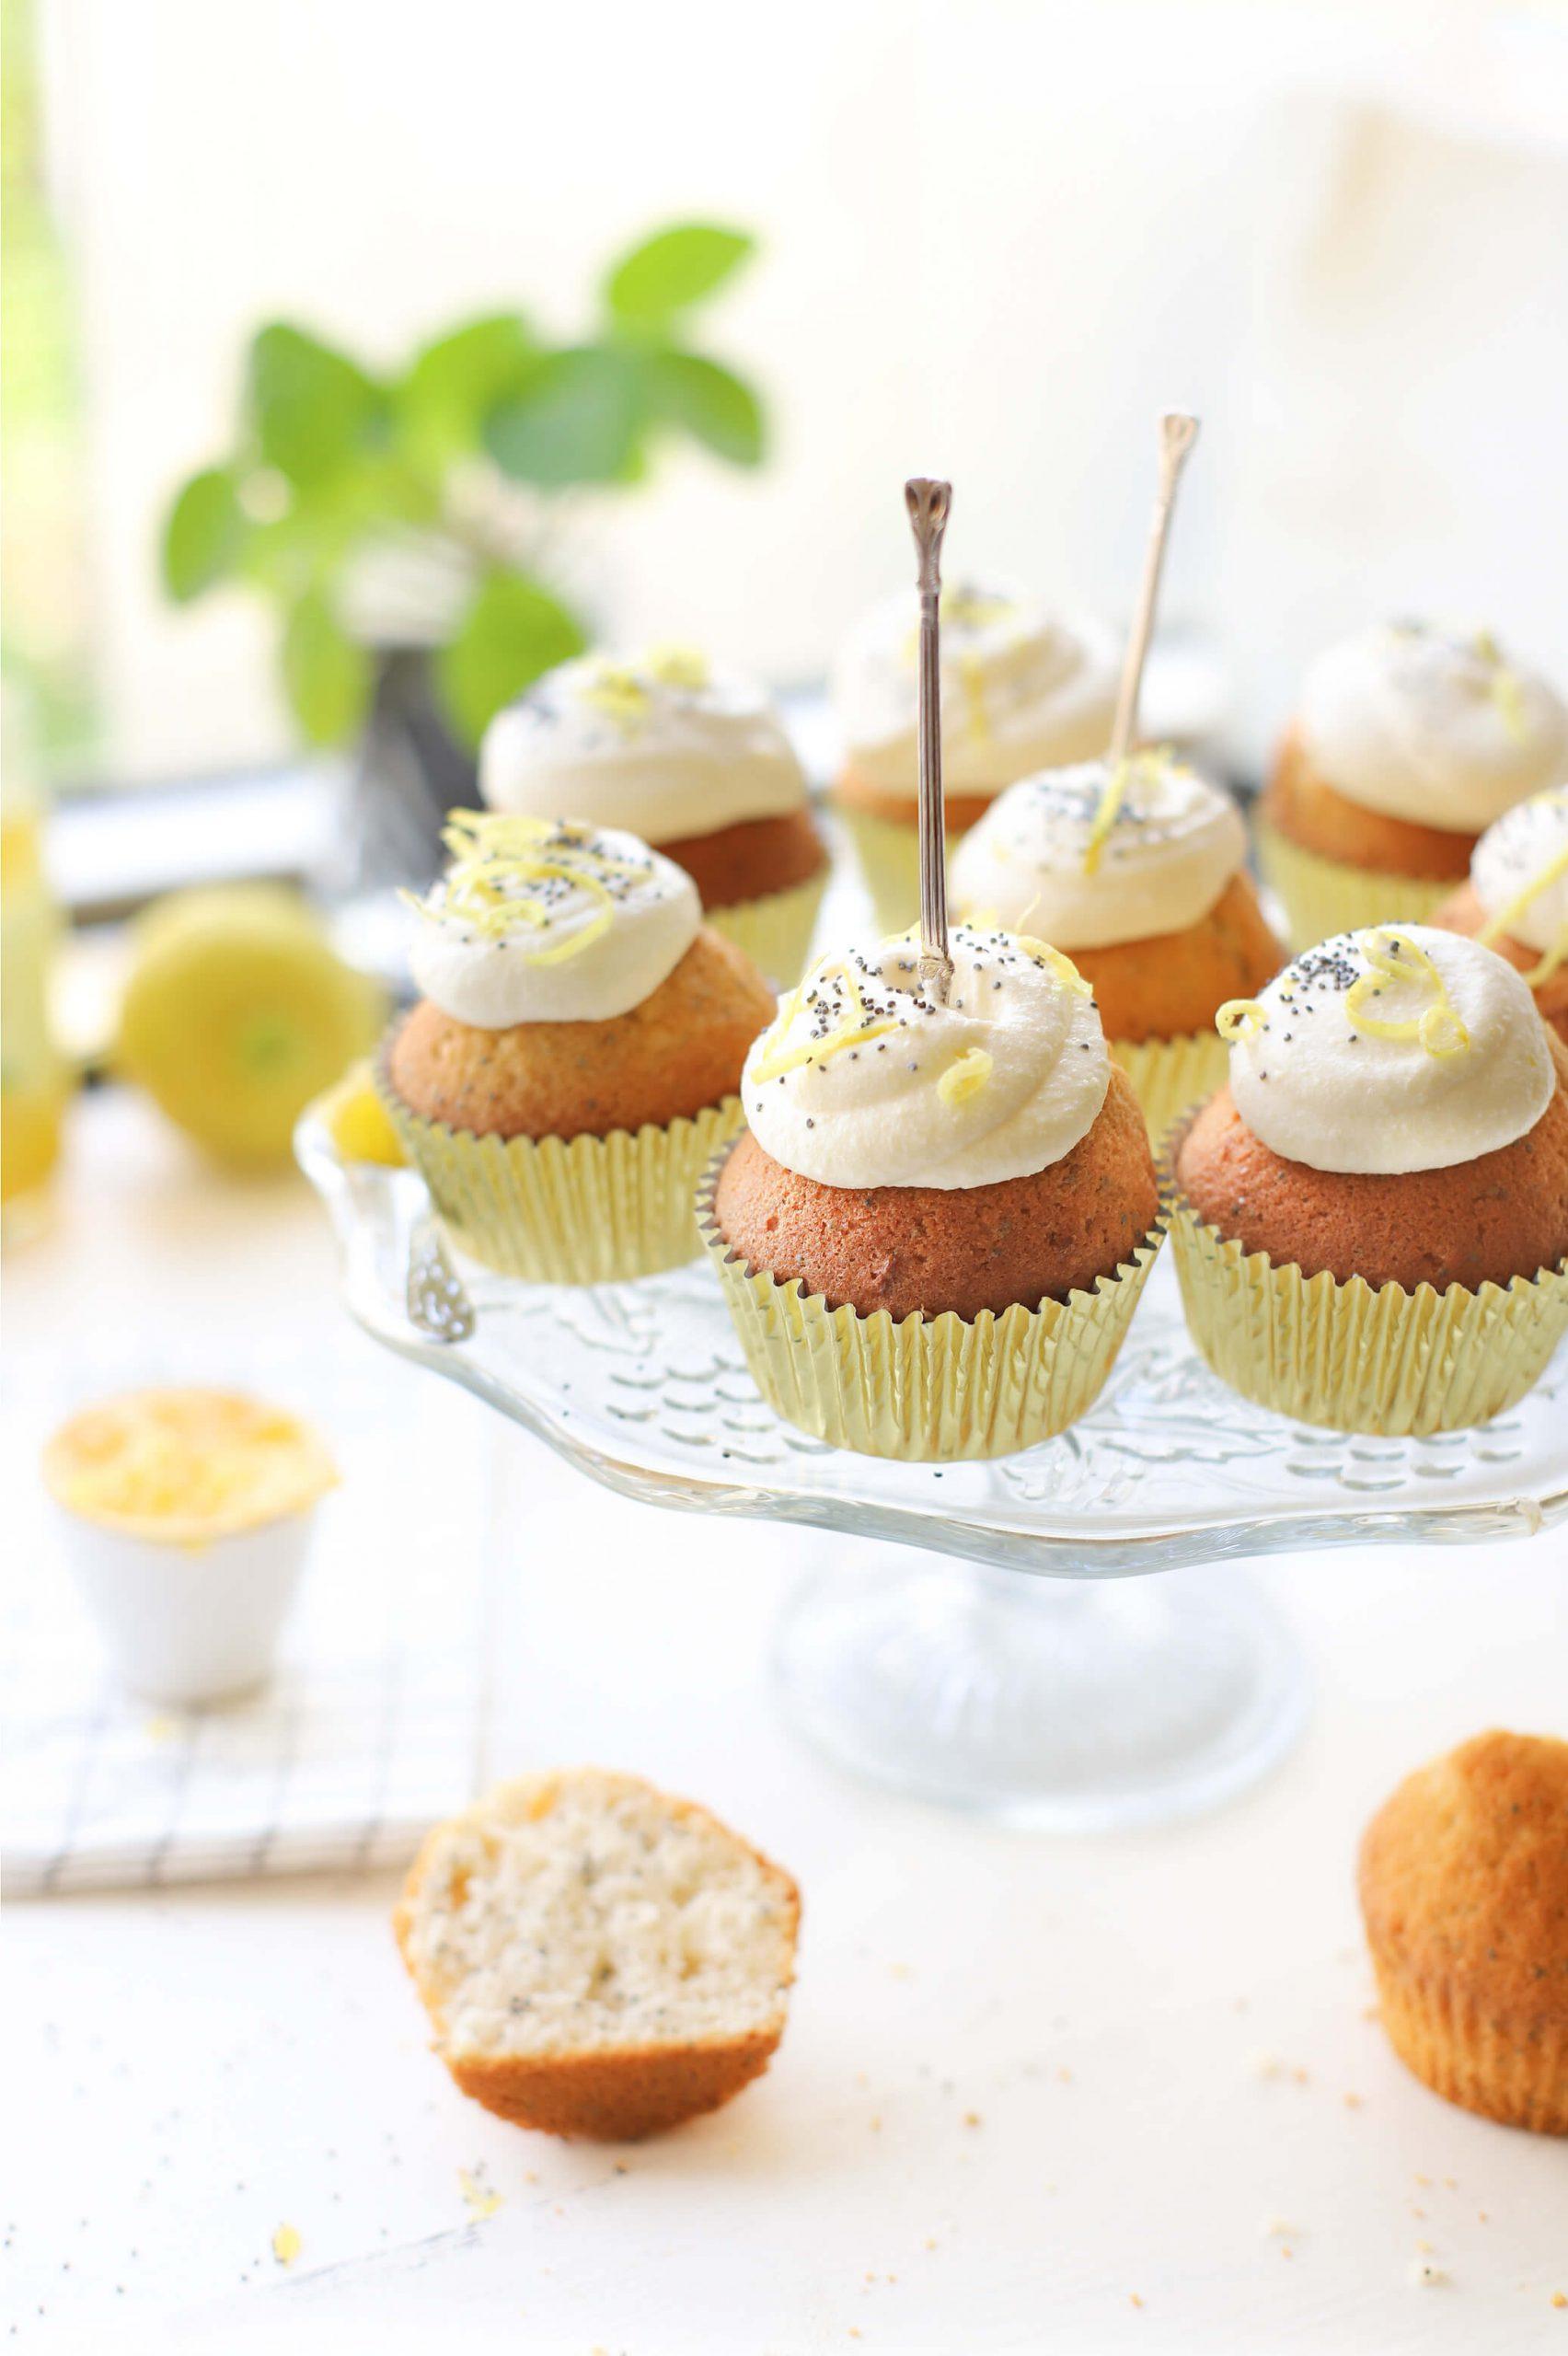 Citroen cupcakes met maanzaad & ricotta-lemoncurd 'Recept The lemon Kitchen